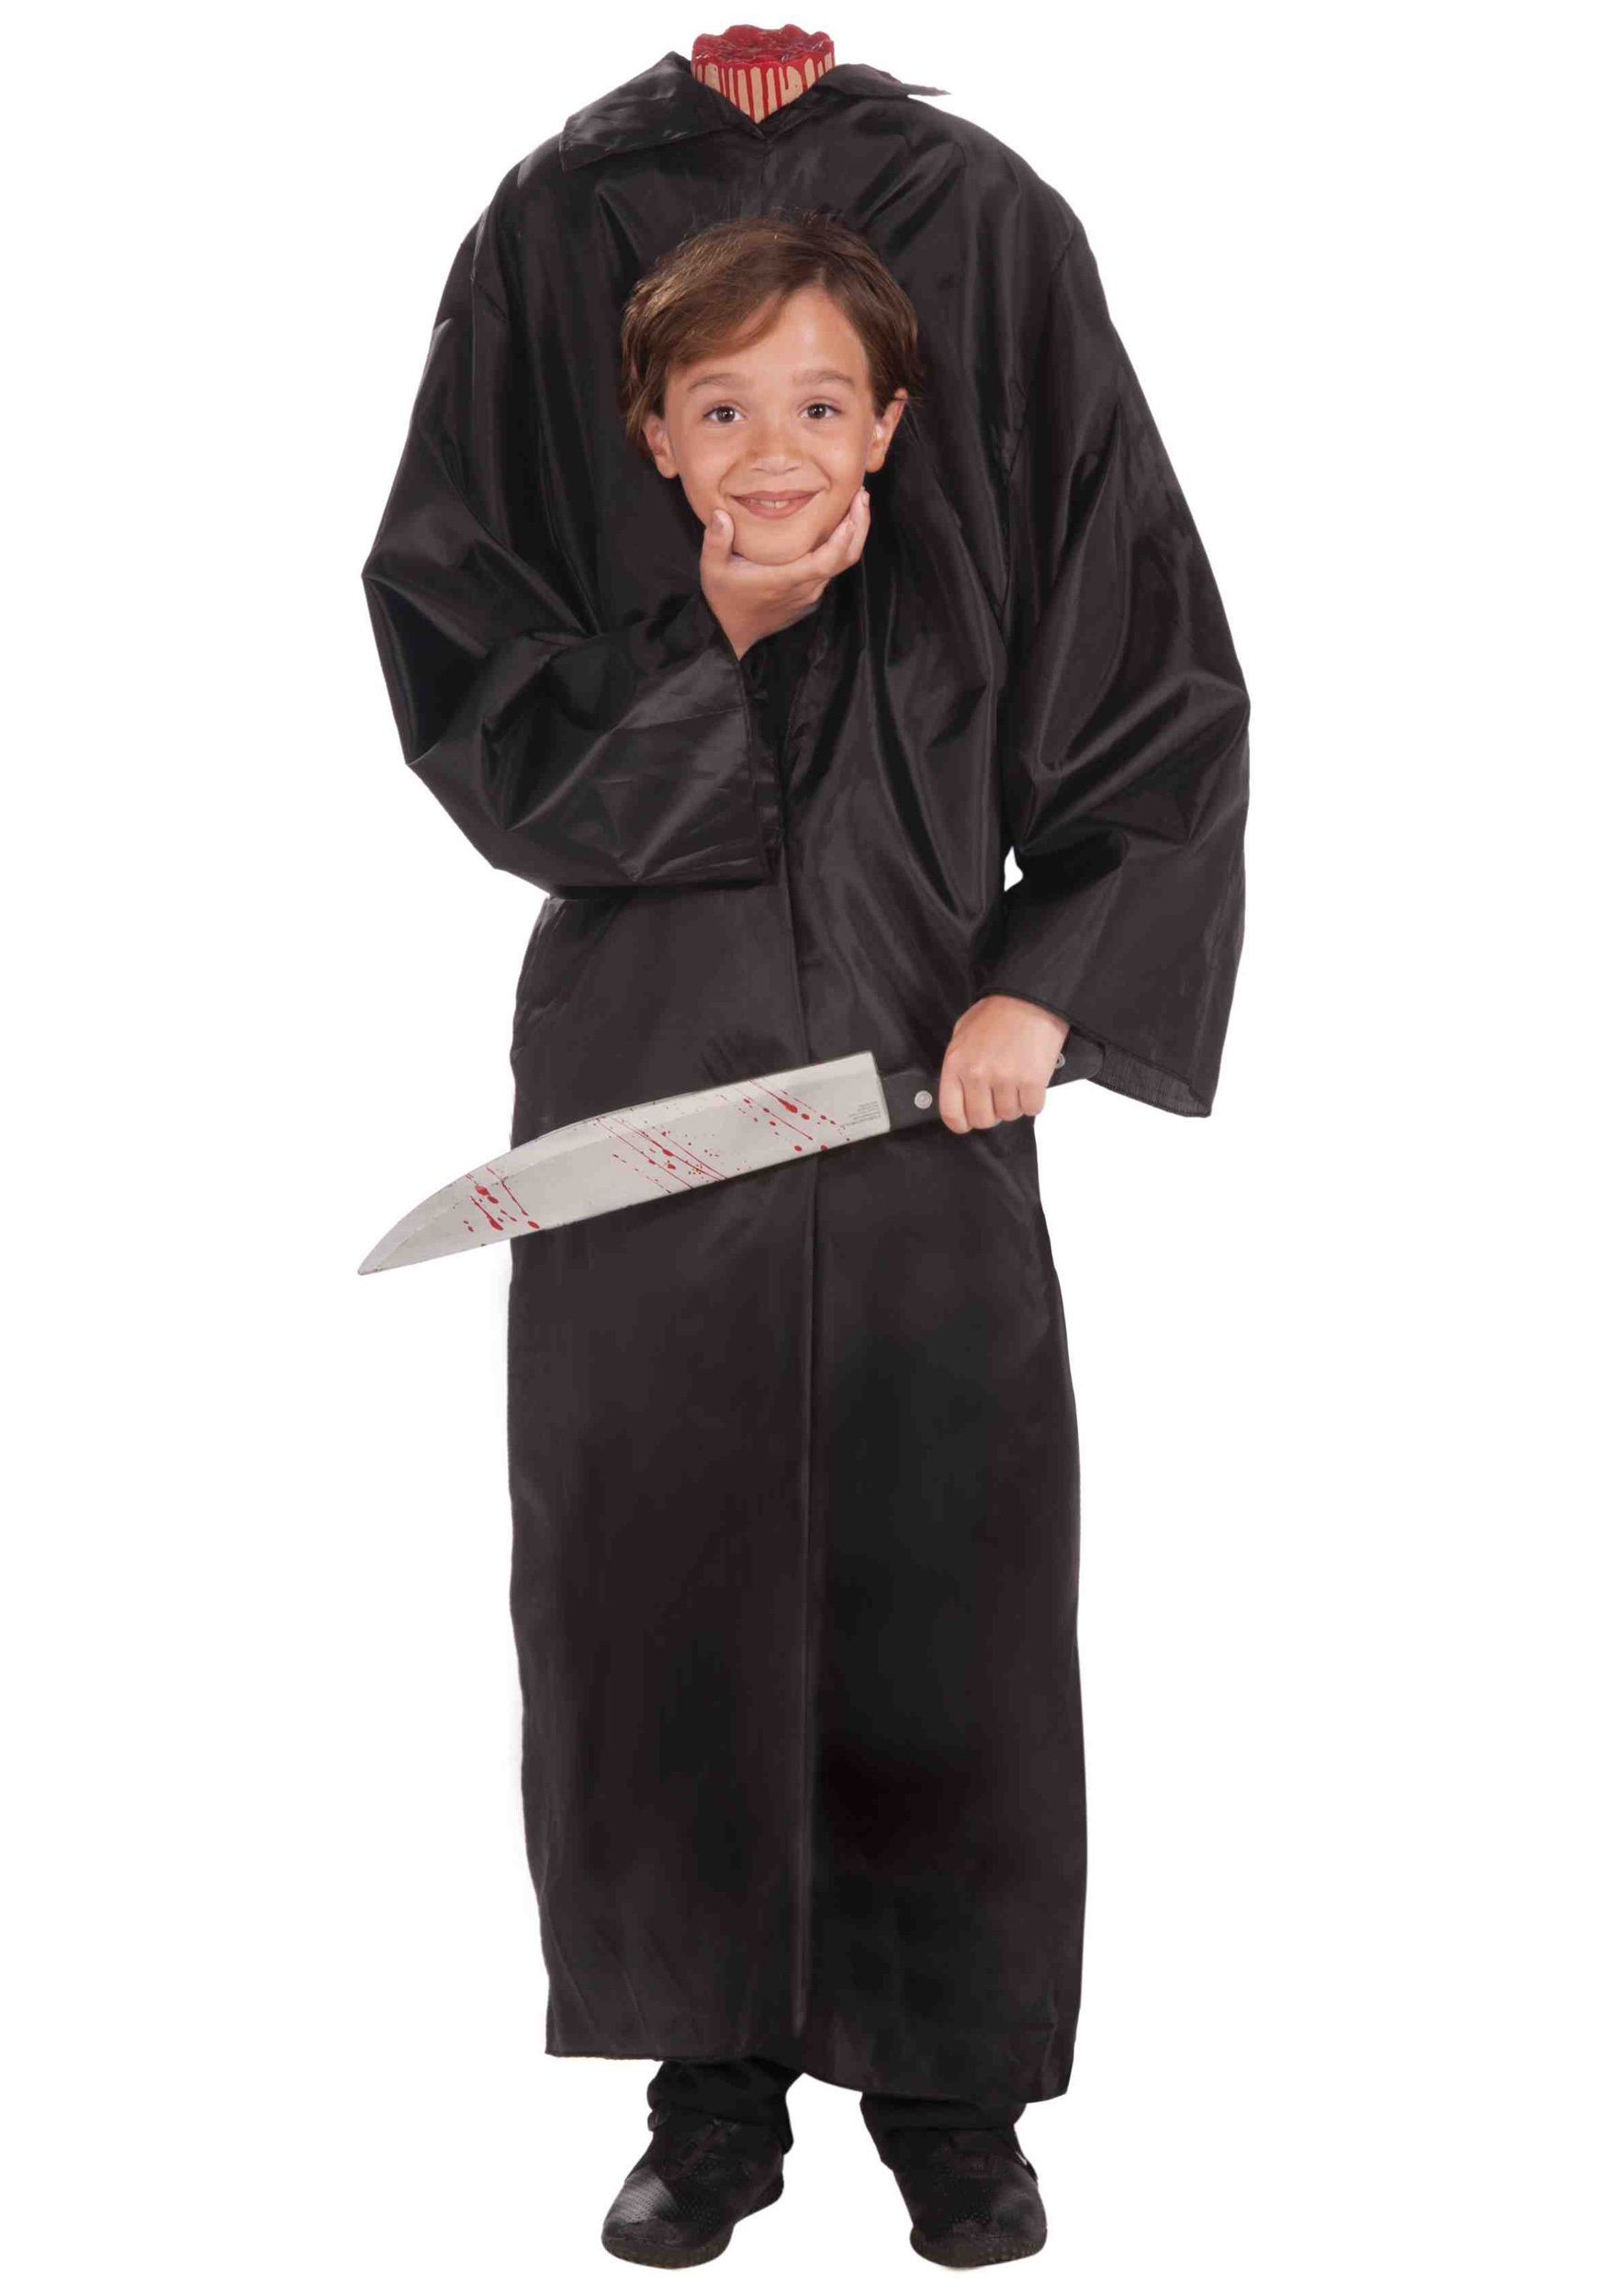 Child Headless Boy Costume  sc 1 st  Halloween Costumes & Child Headless Boy Costume - Halloween Costumes